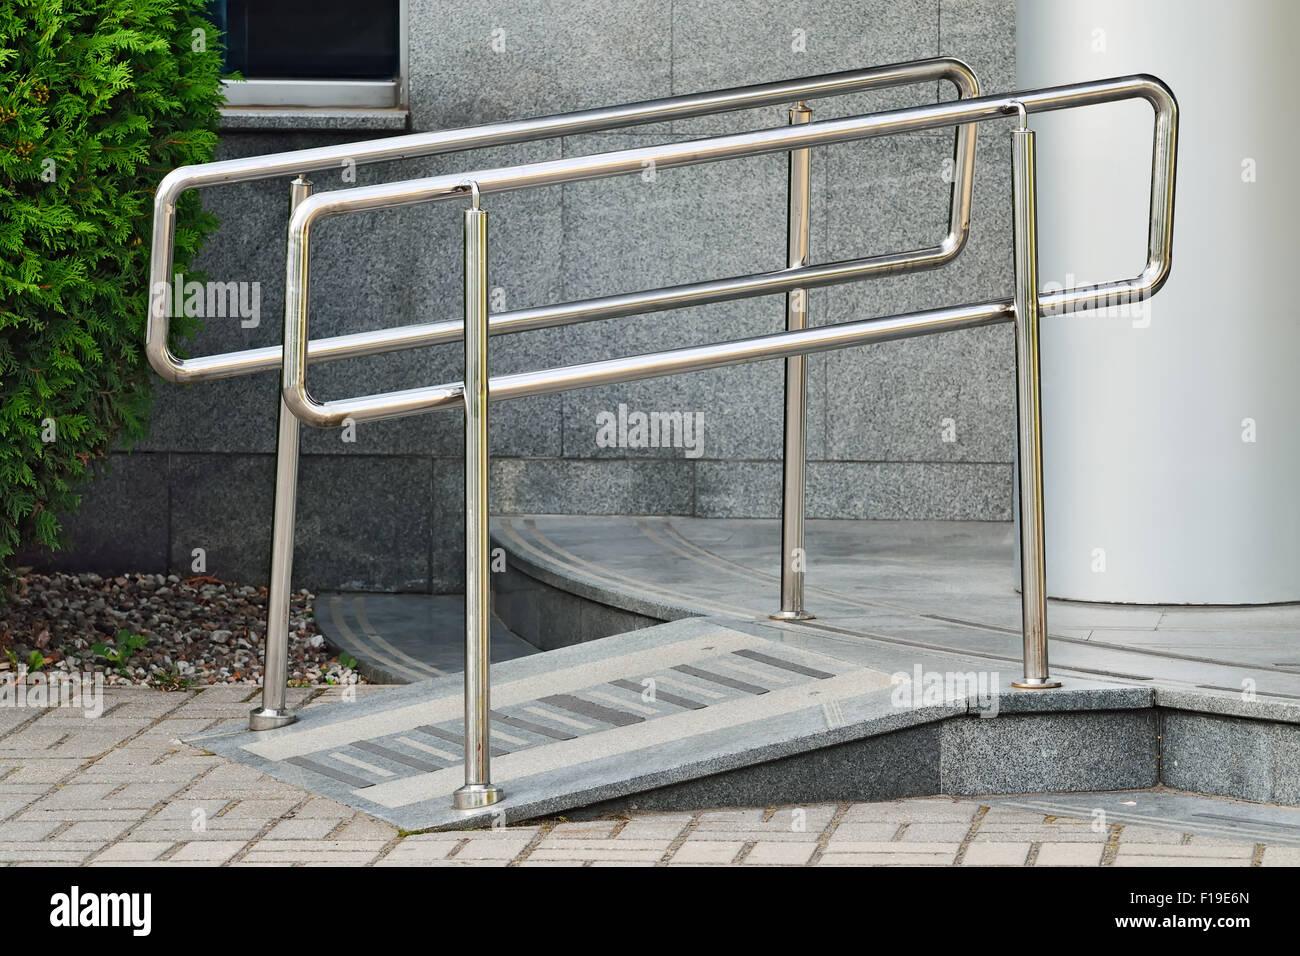 Ramp access stockfotos ramp access bilder alamy - Rampe bauen fur rollstuhl ...